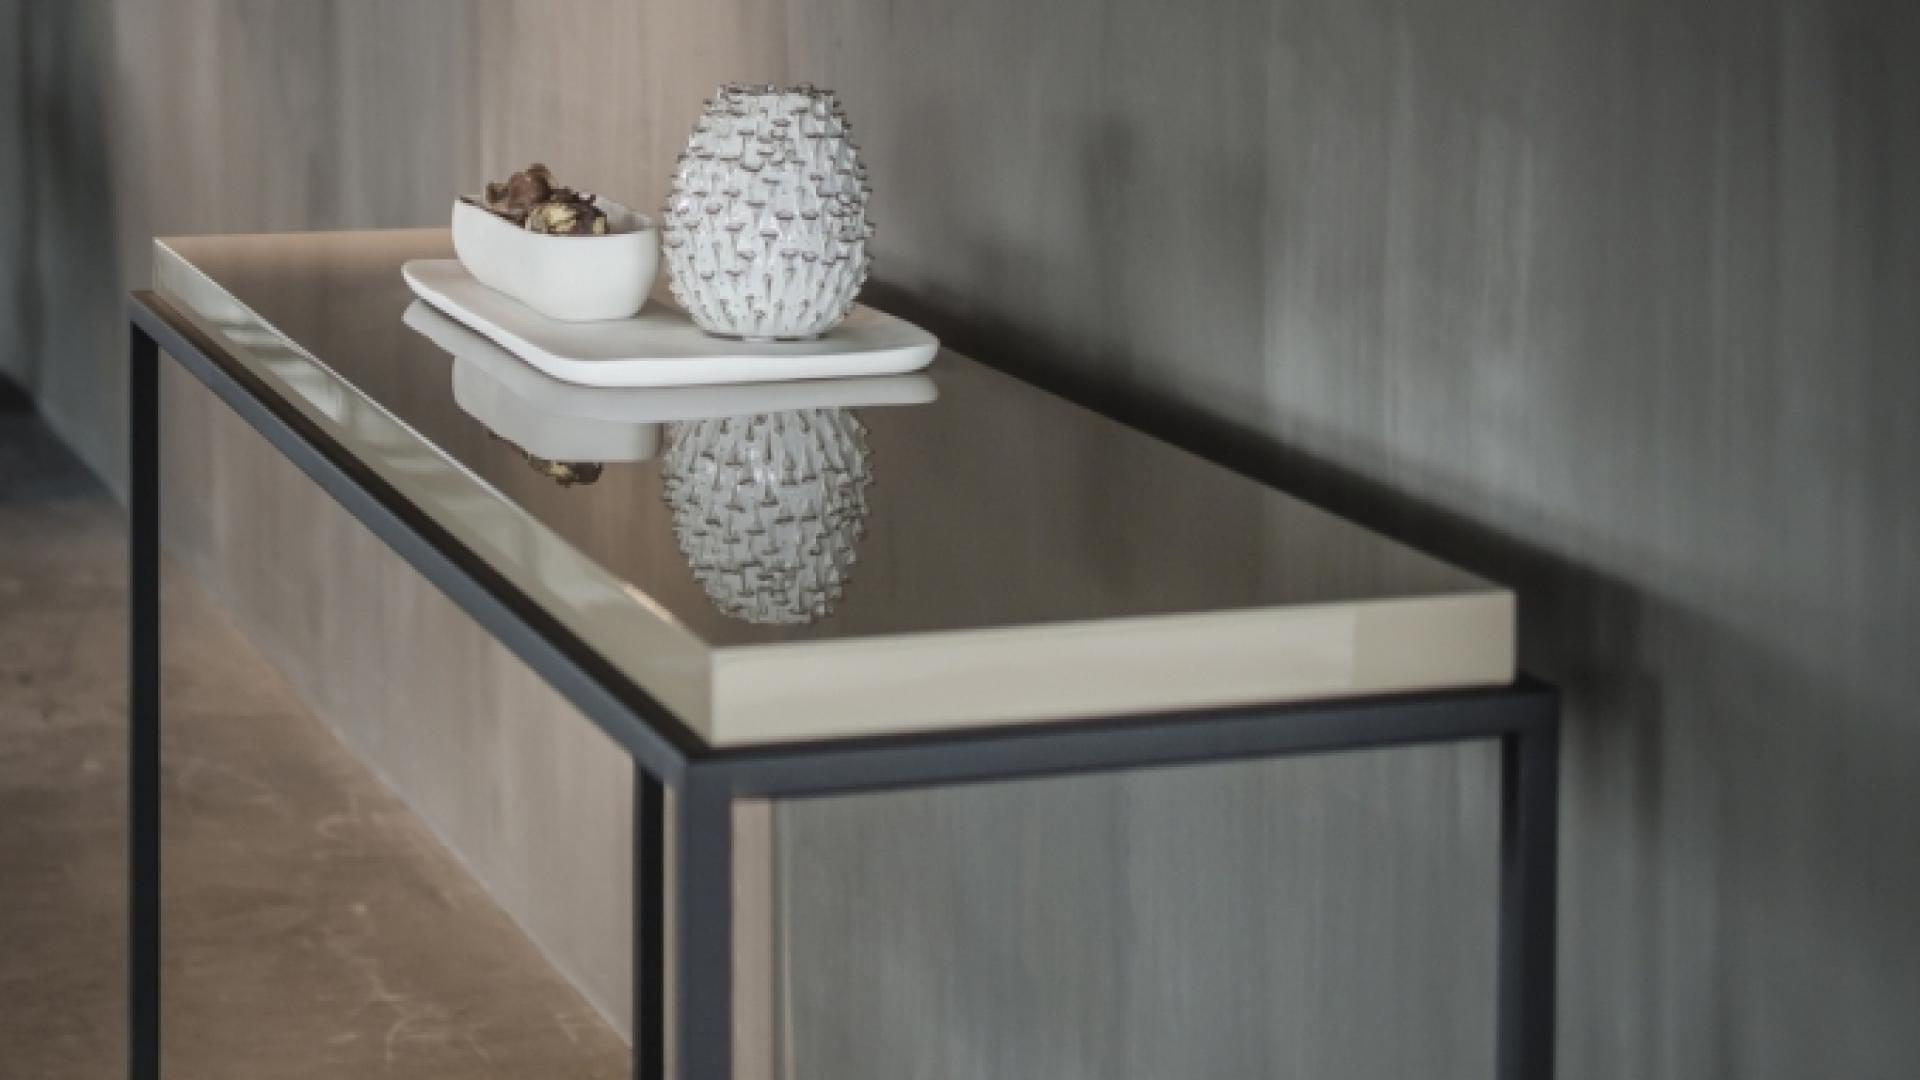 Nilson_Beds_Menton_side_table_high_gloss.jpg